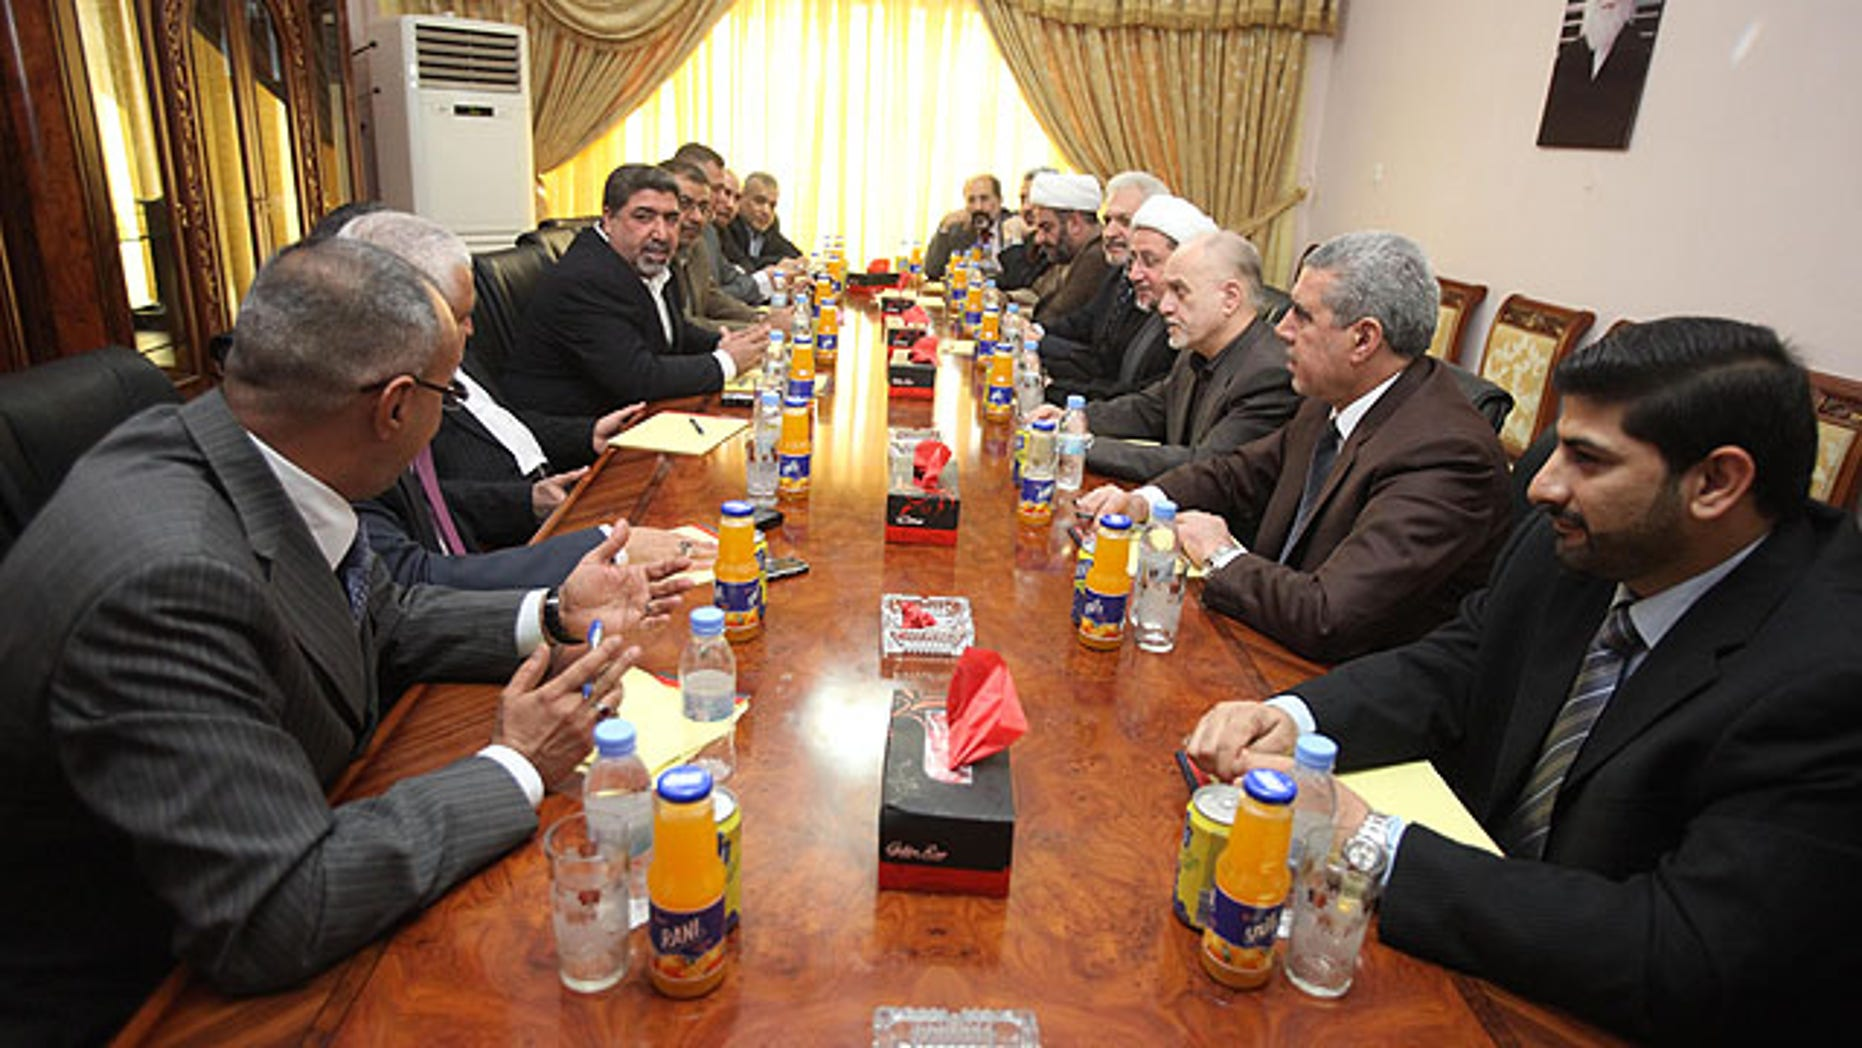 Oct. 1, 2010: Representatives of Shiite cleric Muqtada al-Sadr and Iraqi Prime Minister Nouri  al-Maliki's political parties meet in Baghdad, Iraq.